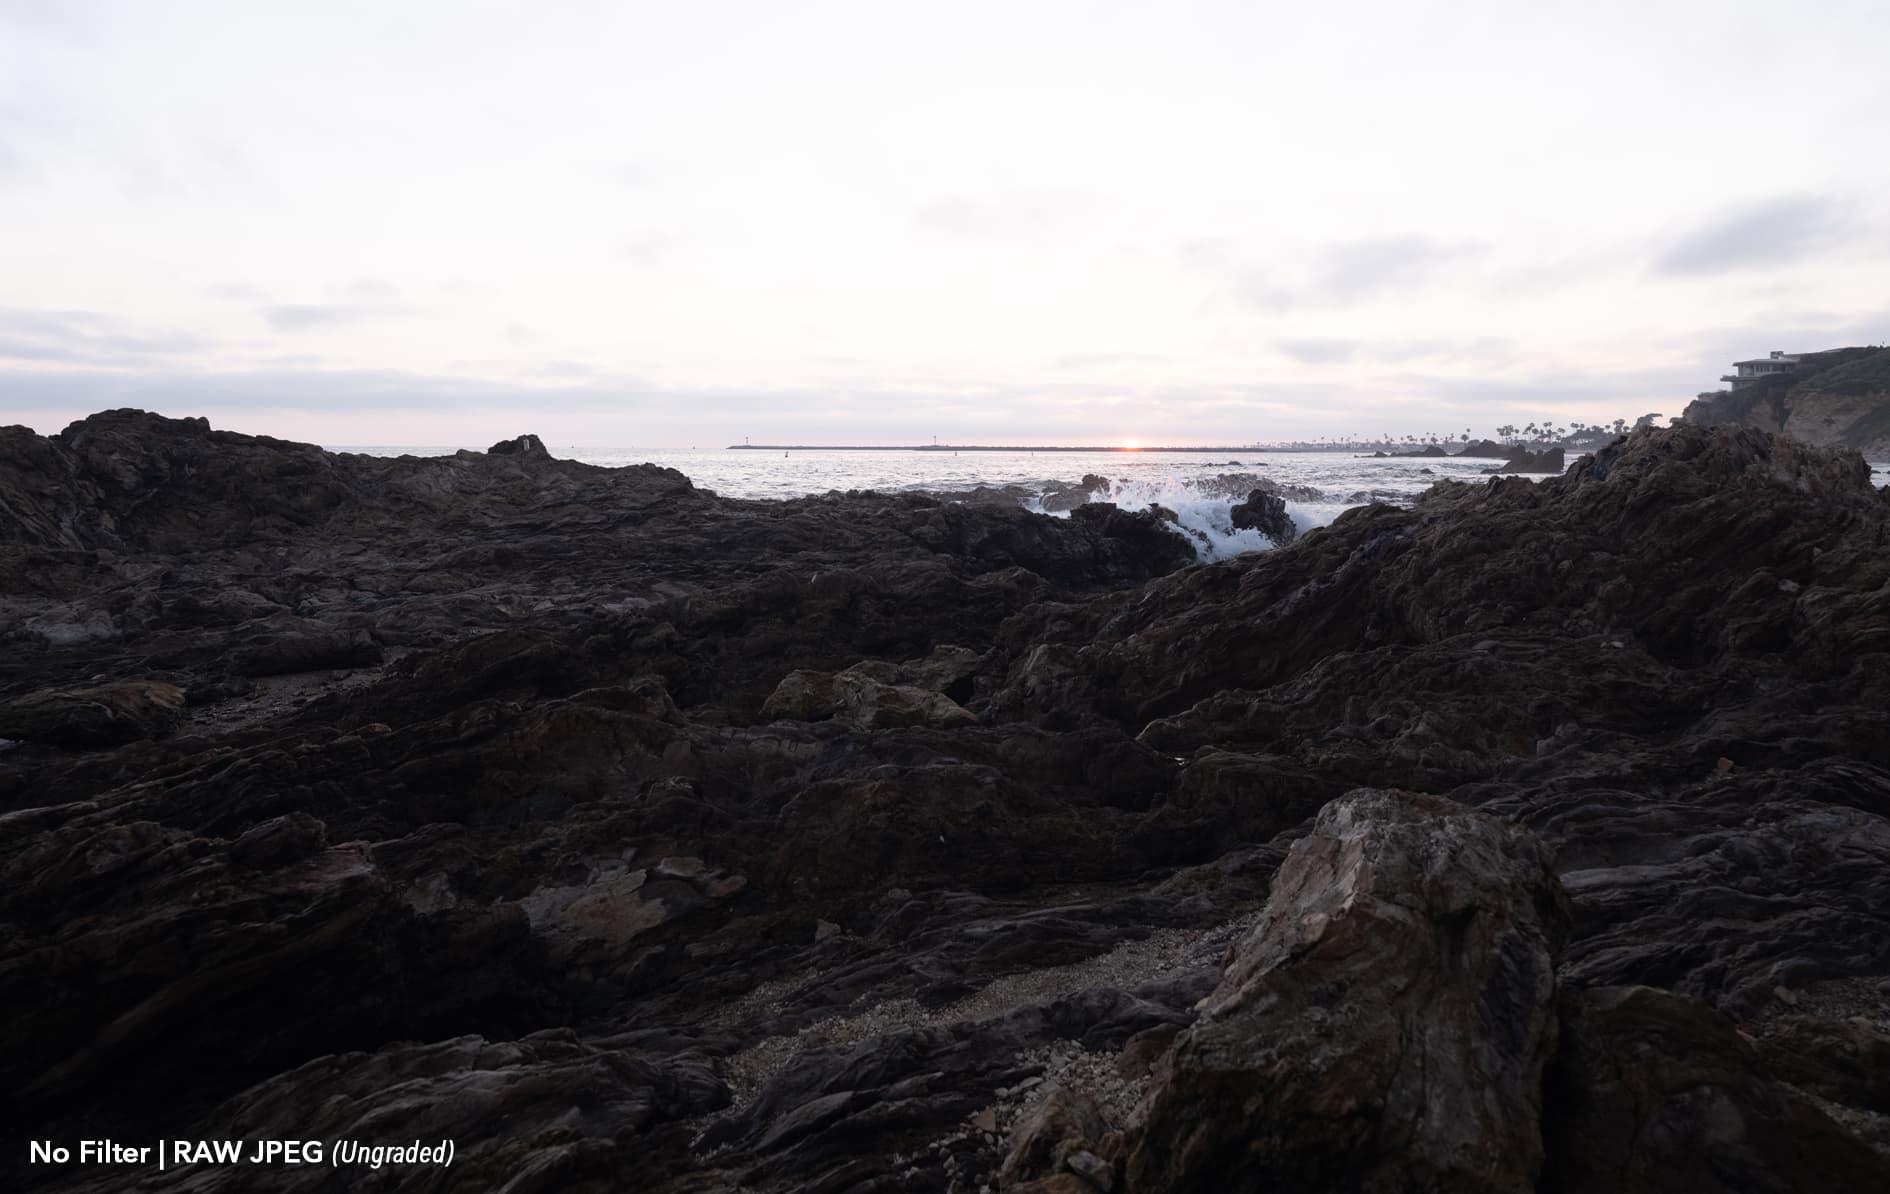 Landscape Photography Filters, Landscape Filters, ND filter for landscape photography